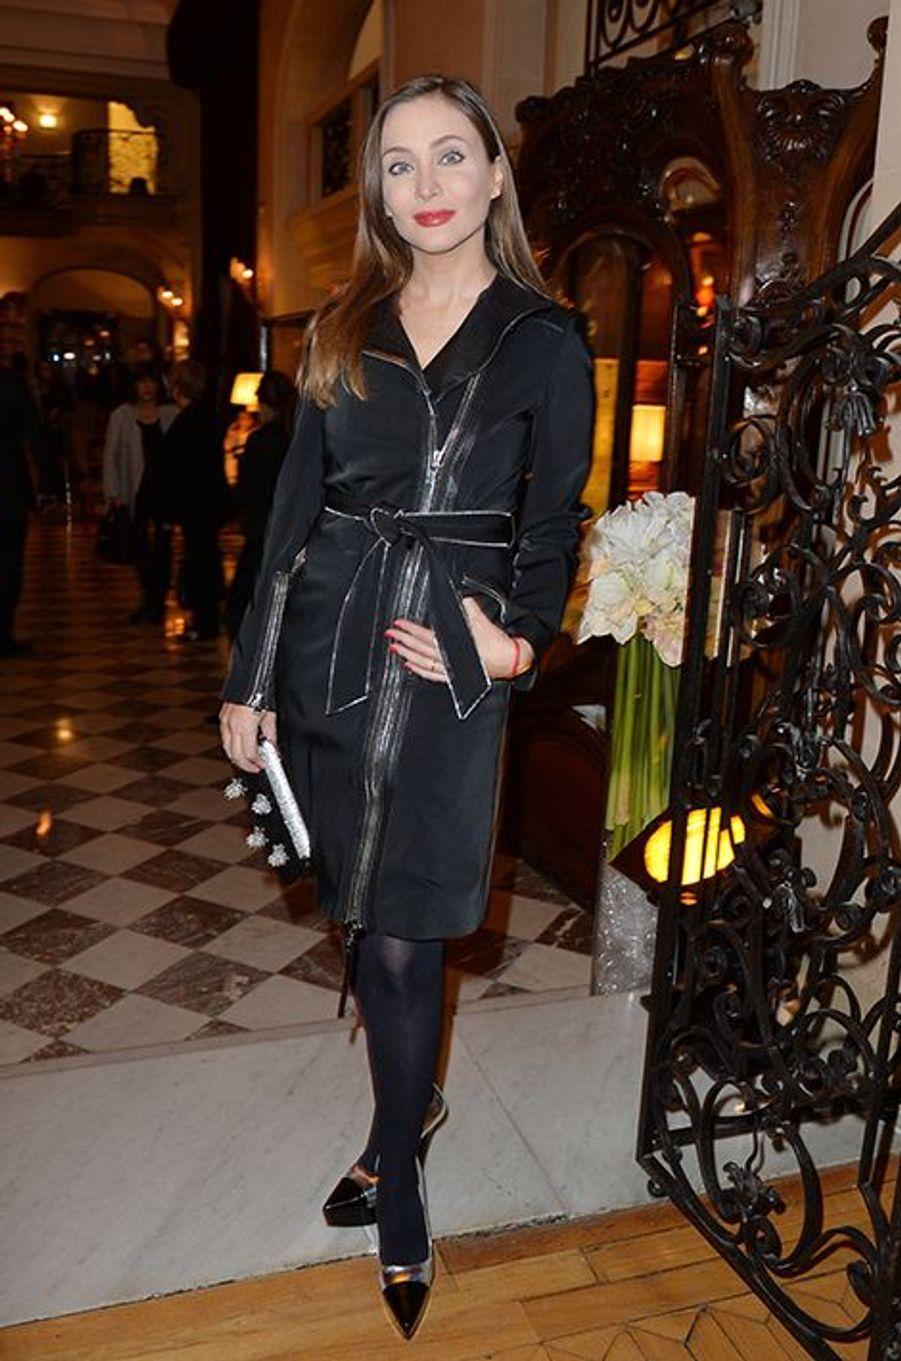 Isabella Orsini à l'hôtel Régina de Paris le lundi 13 octobre 2014